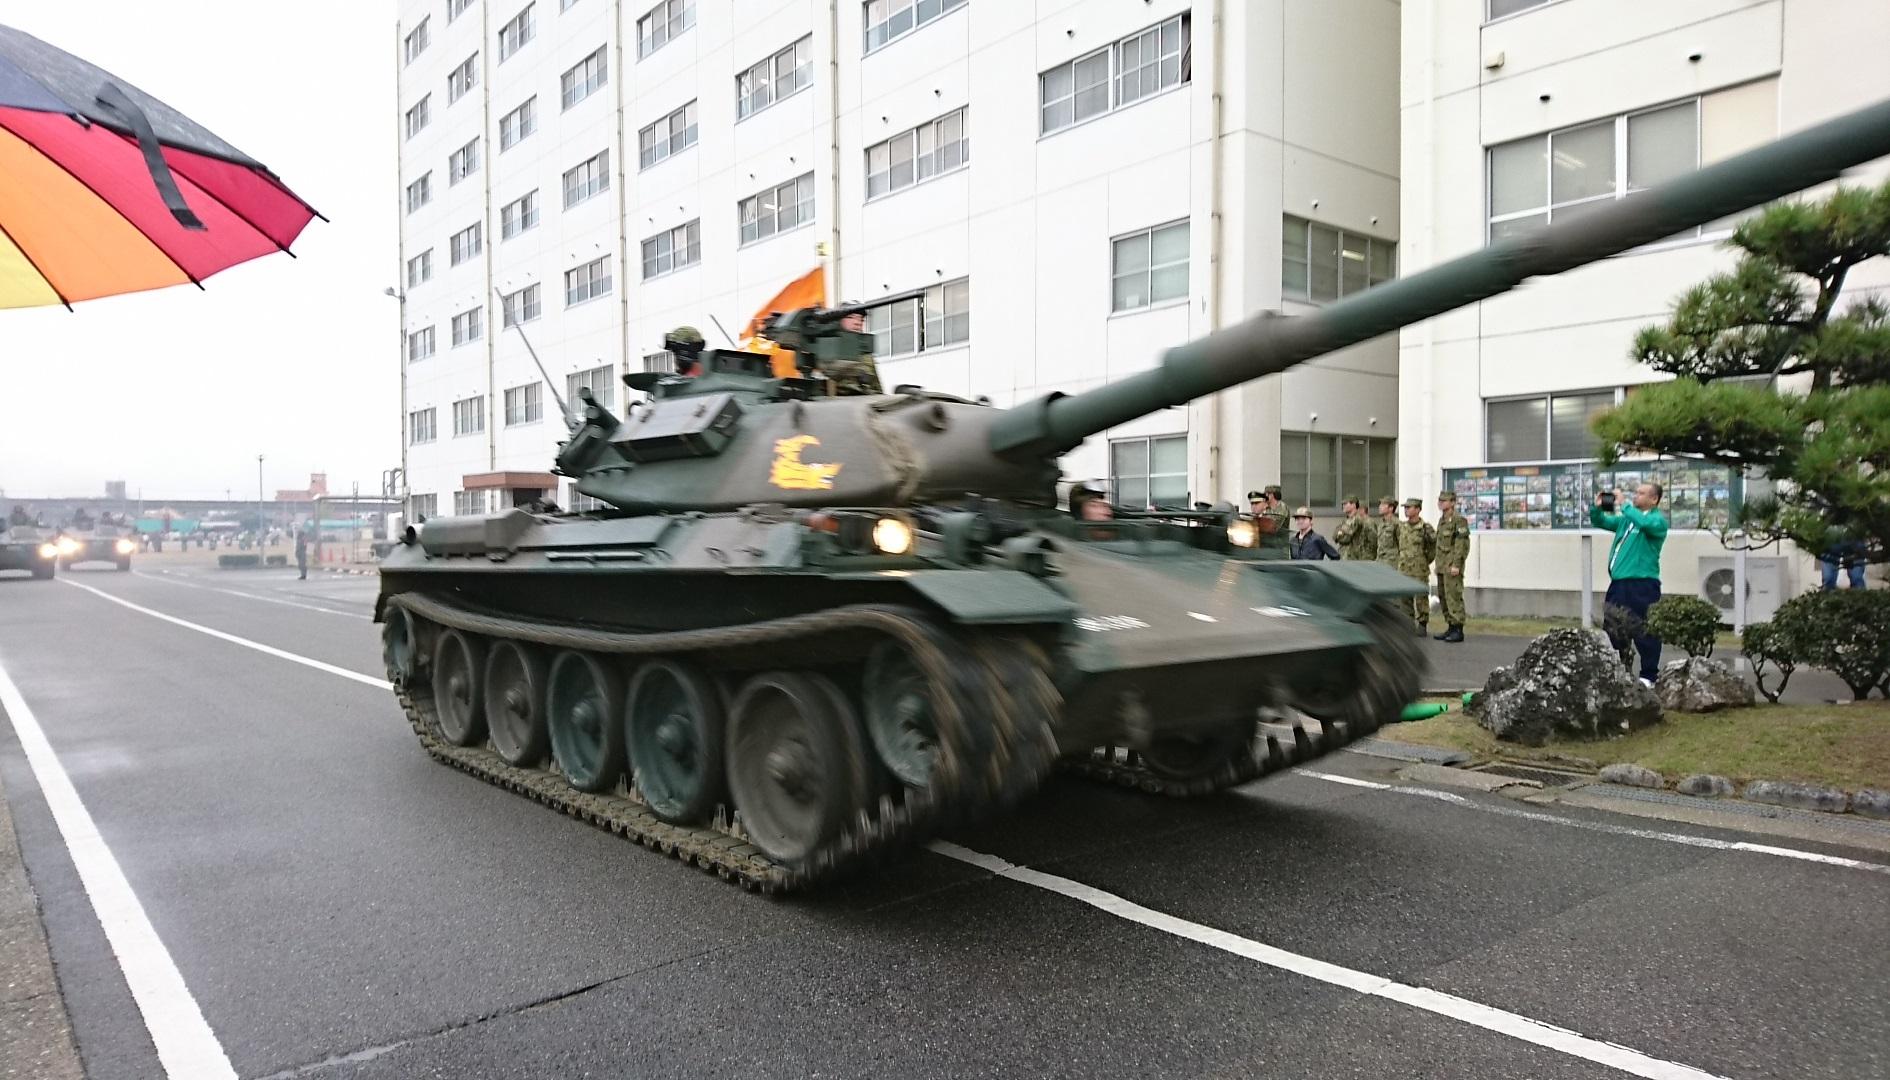 2017.10.28 守山駐屯地 (30) 74式戦車の行進 1890-1080